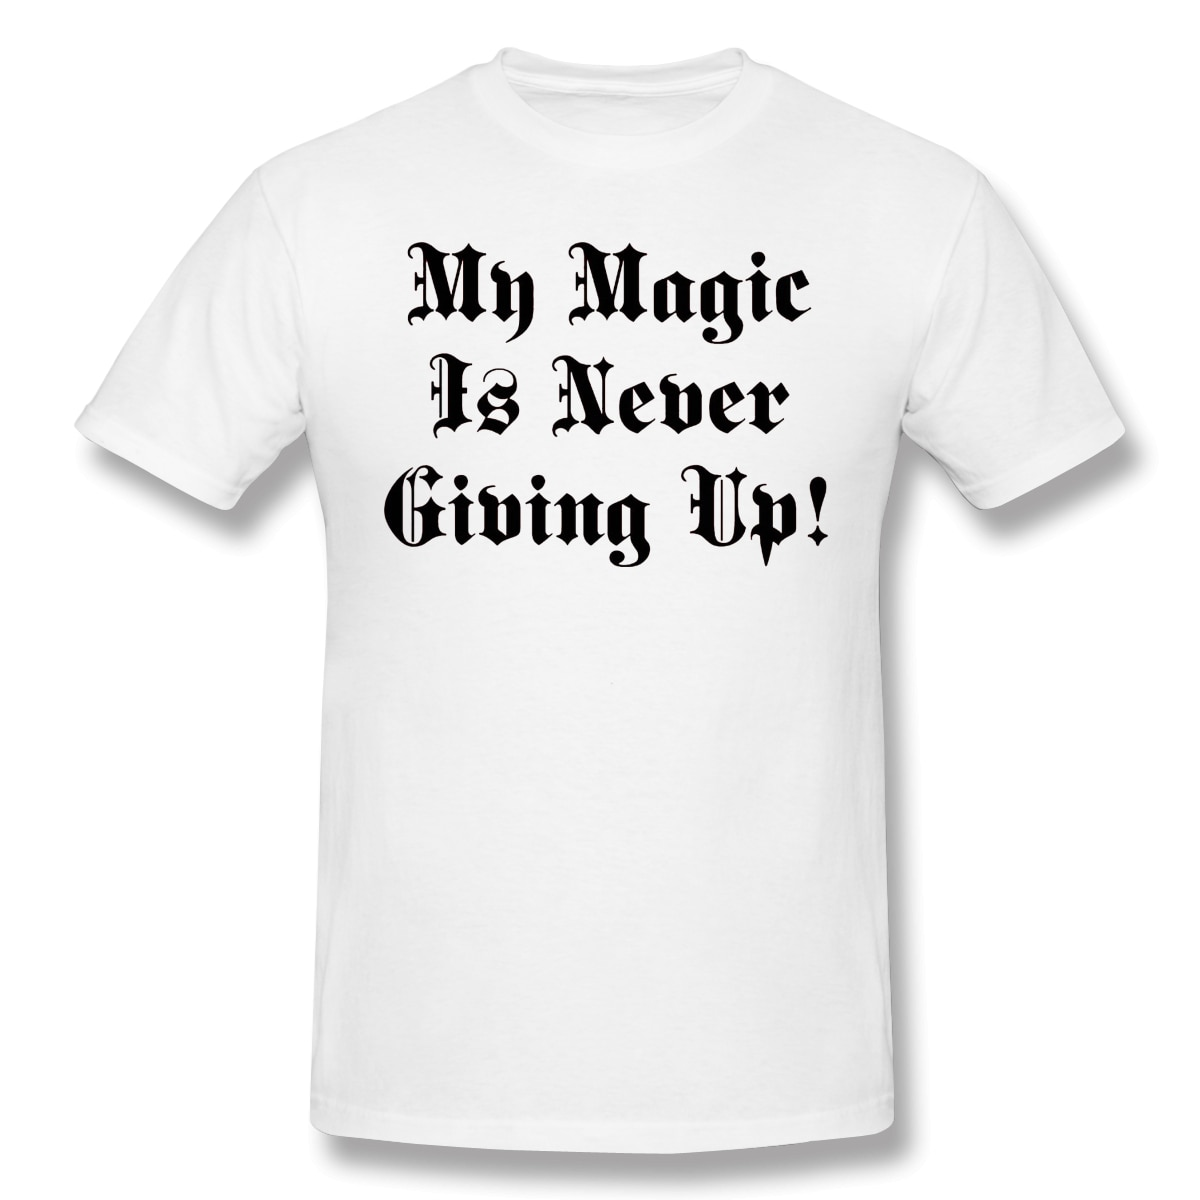 Nueva camiseta de verano, camiseta Astas Catch Phrase, camiseta negra de algodón con trébol de ofertas